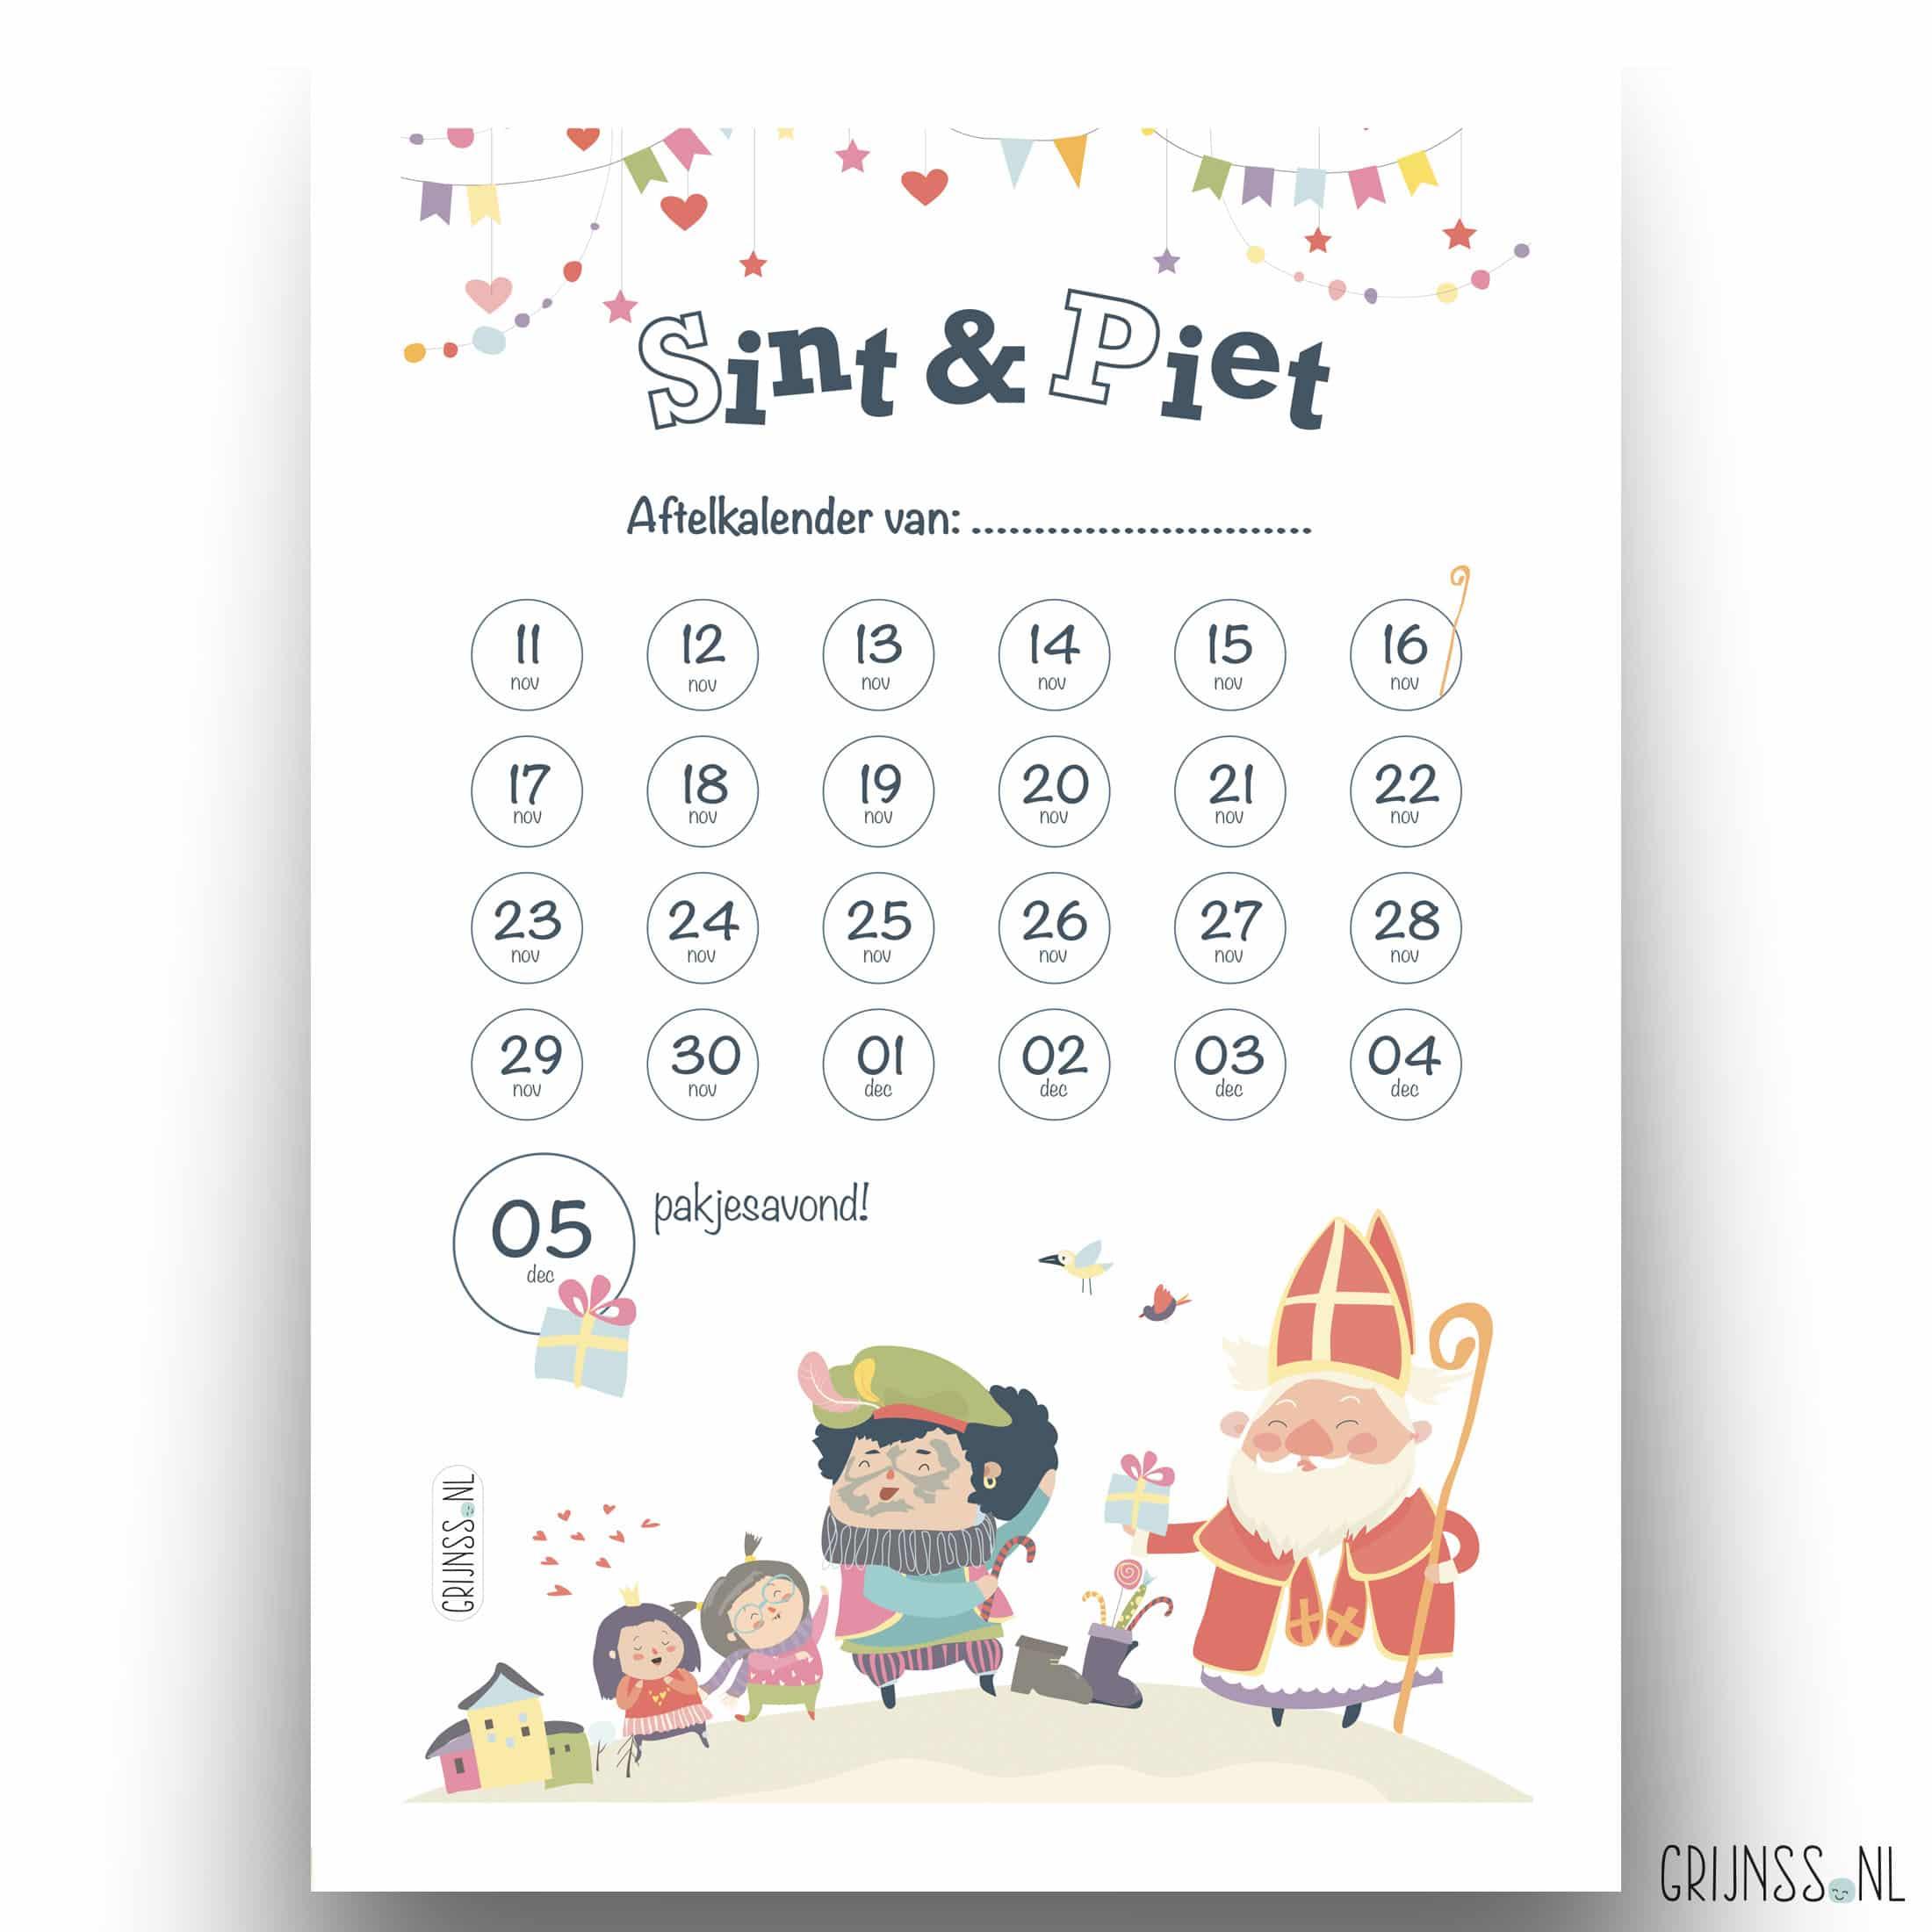 aftelkalender schoenzetkalender sint 2019 gratis